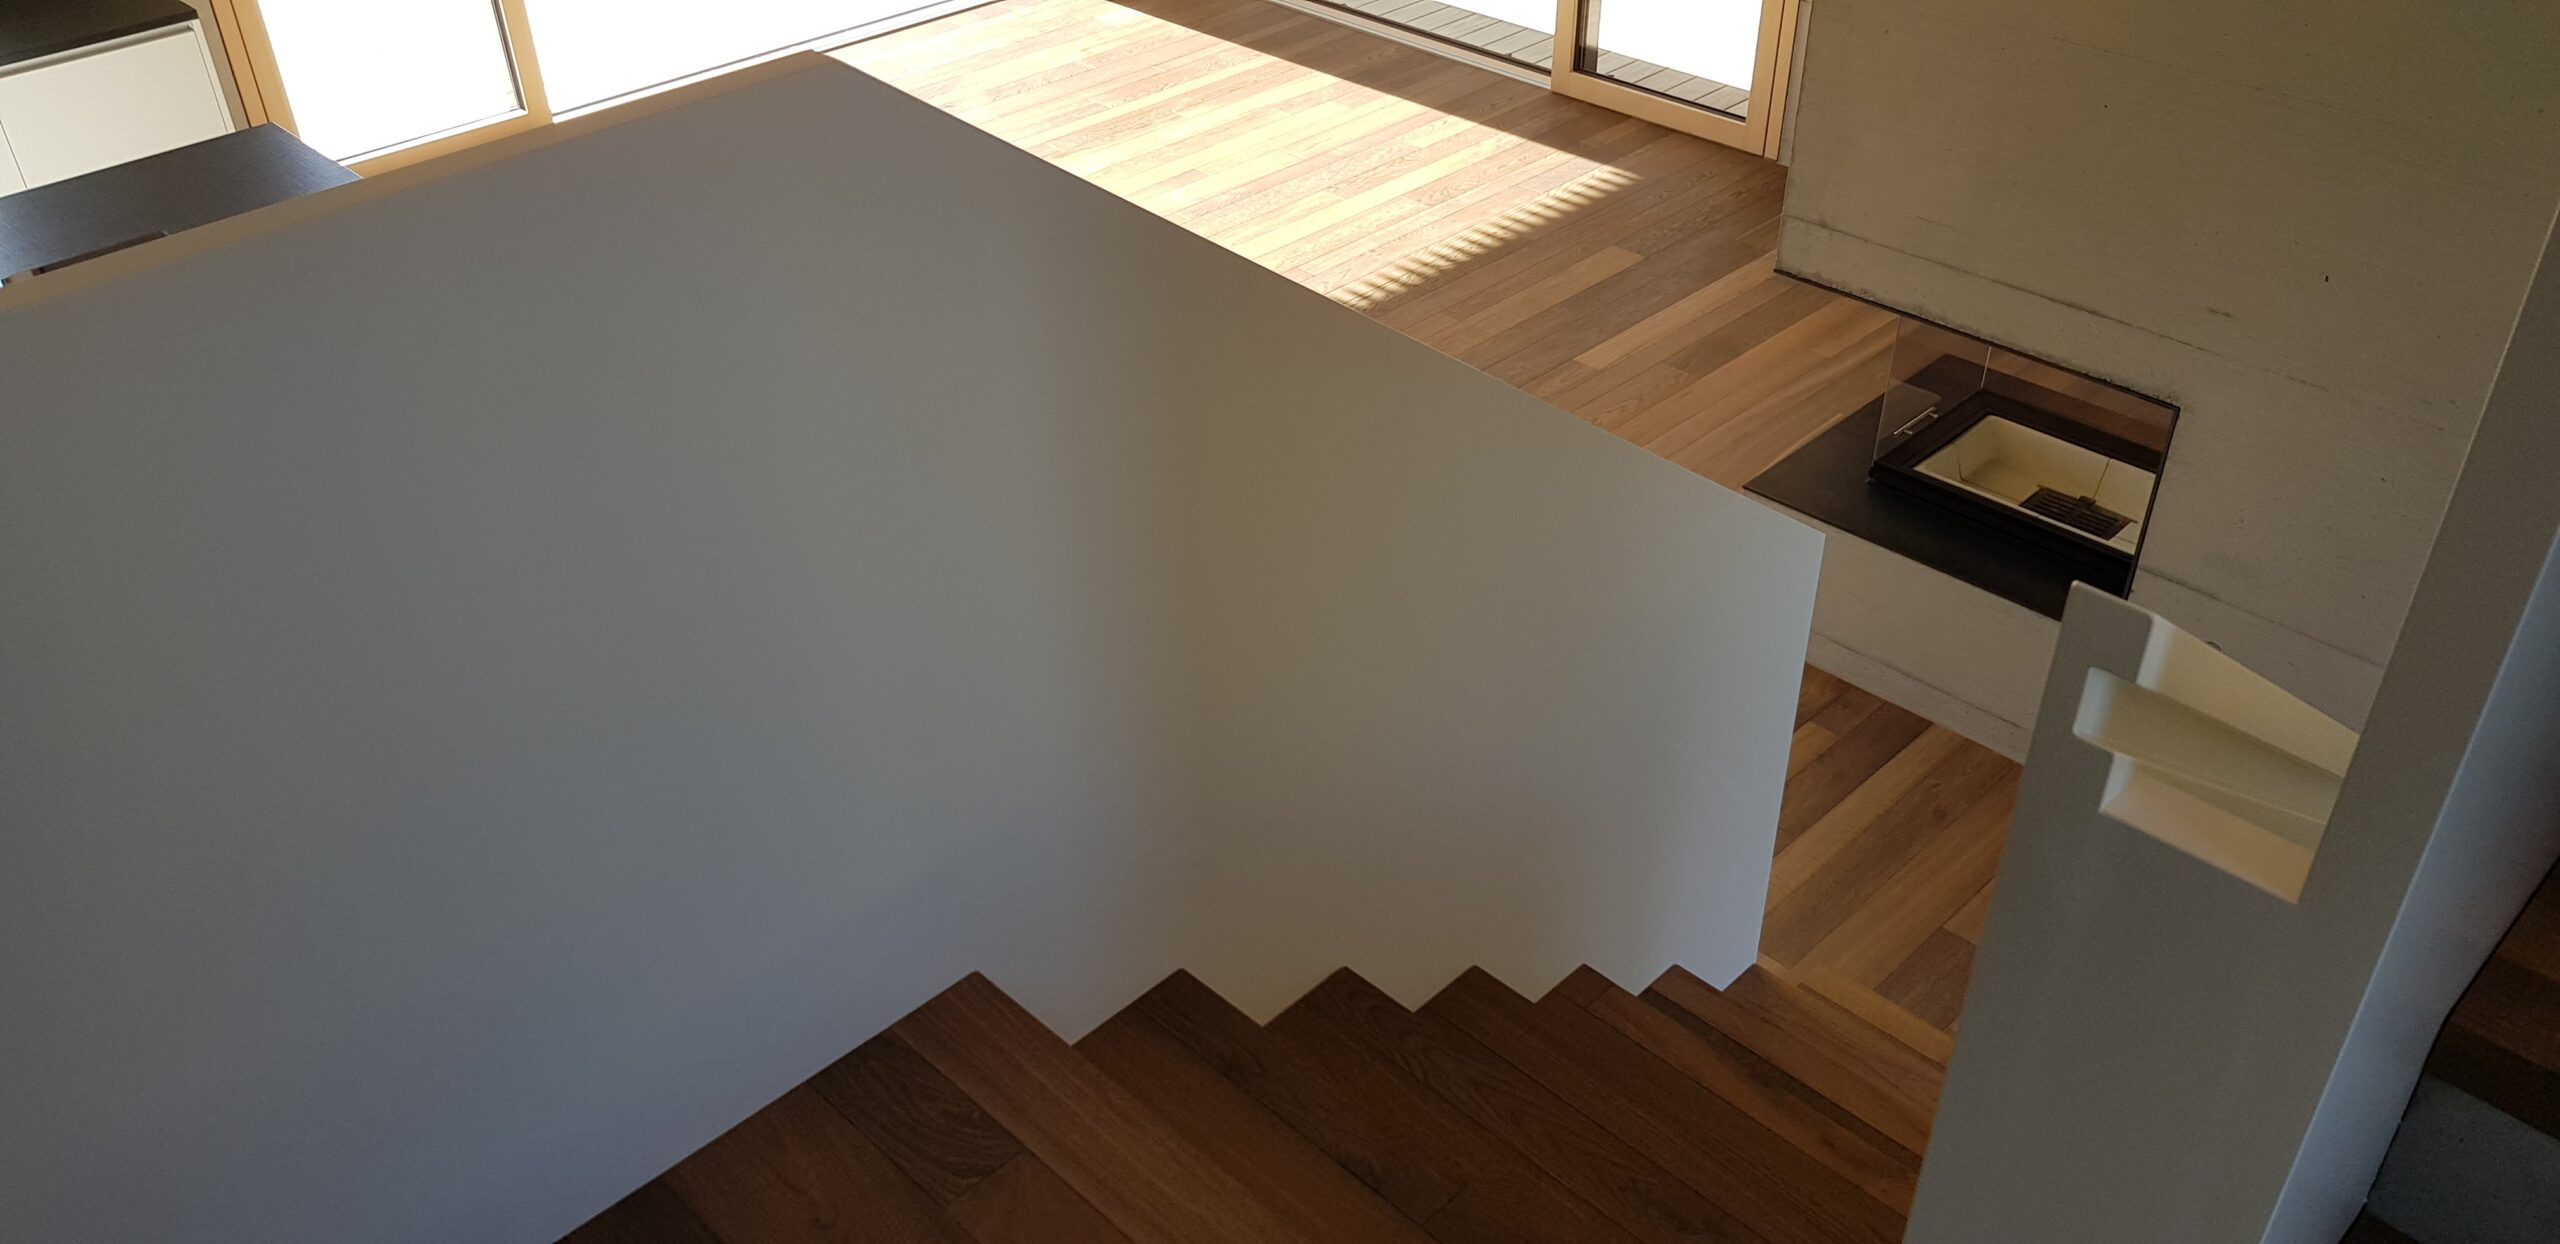 Wooddesign_Treppen_Teppengeländer weiss_Holztreppen_Treppenverkleidung_modern Eiche (3)-min